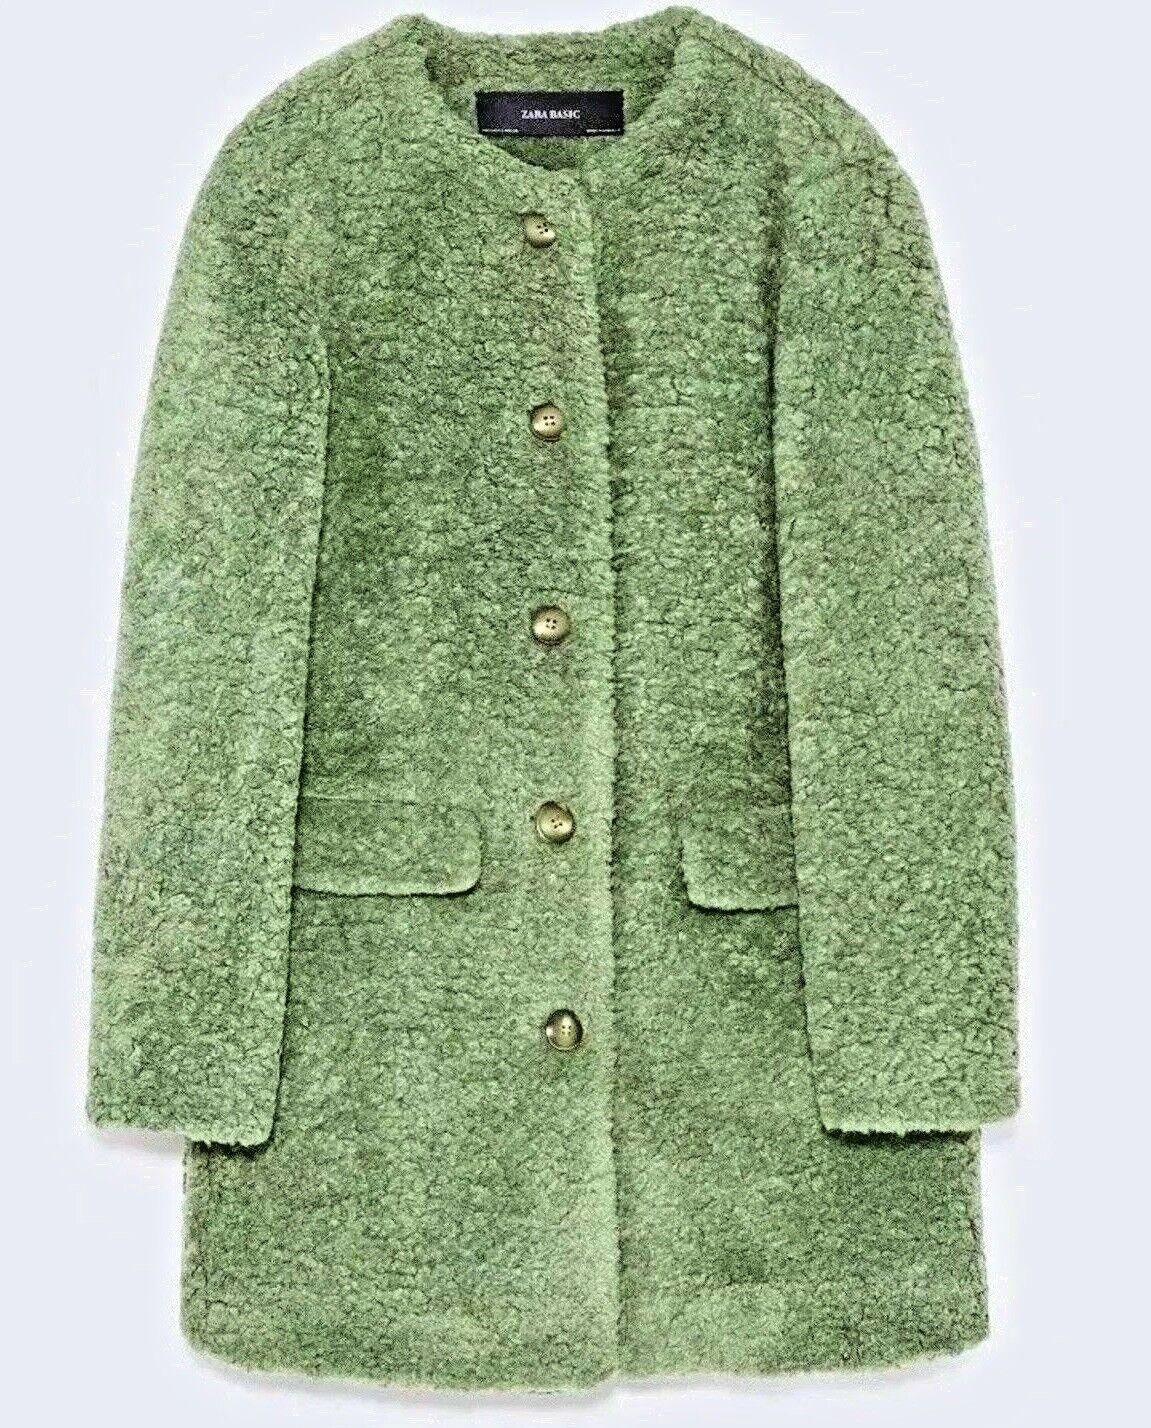 NEW ZARA Shearling Faux Fur Textured Coat Designer Runway Bloggers Fav L,